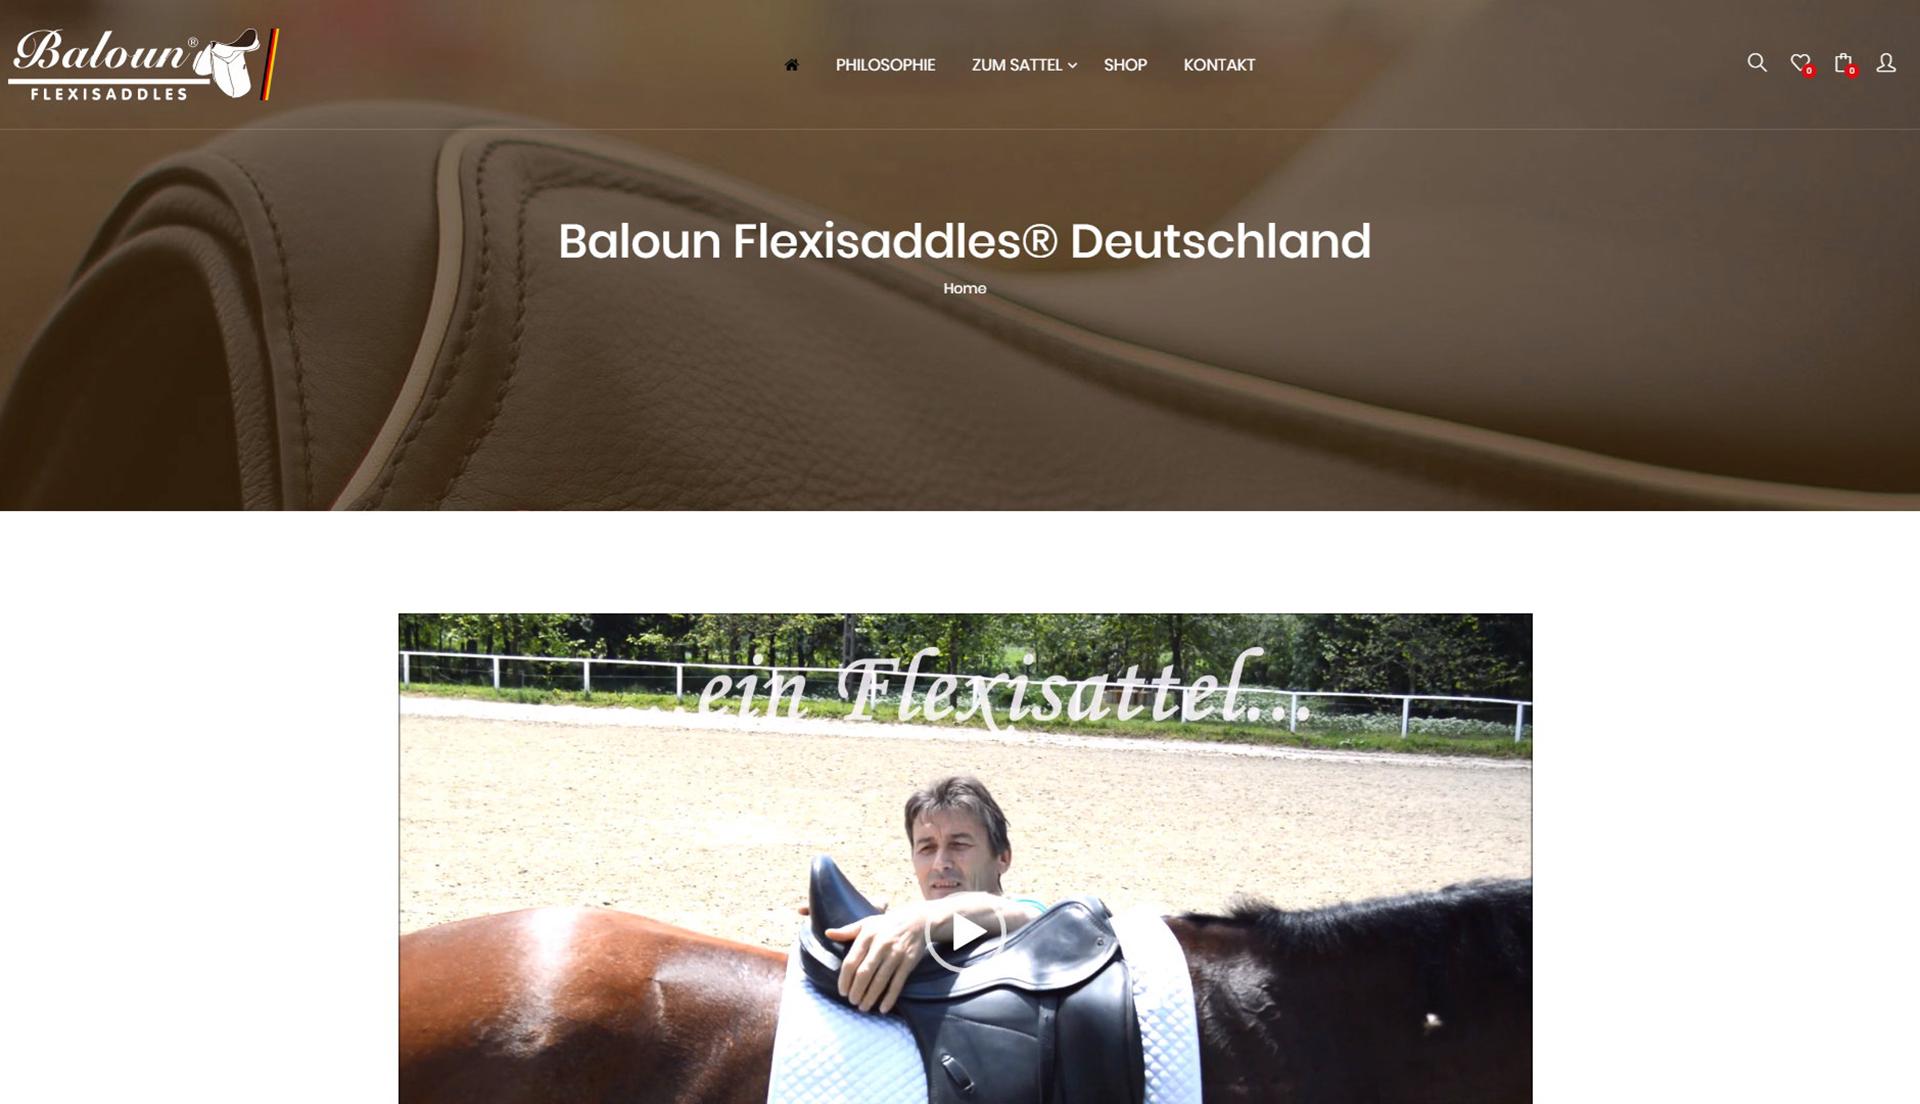 Baloun Pferdesattel Deutschland